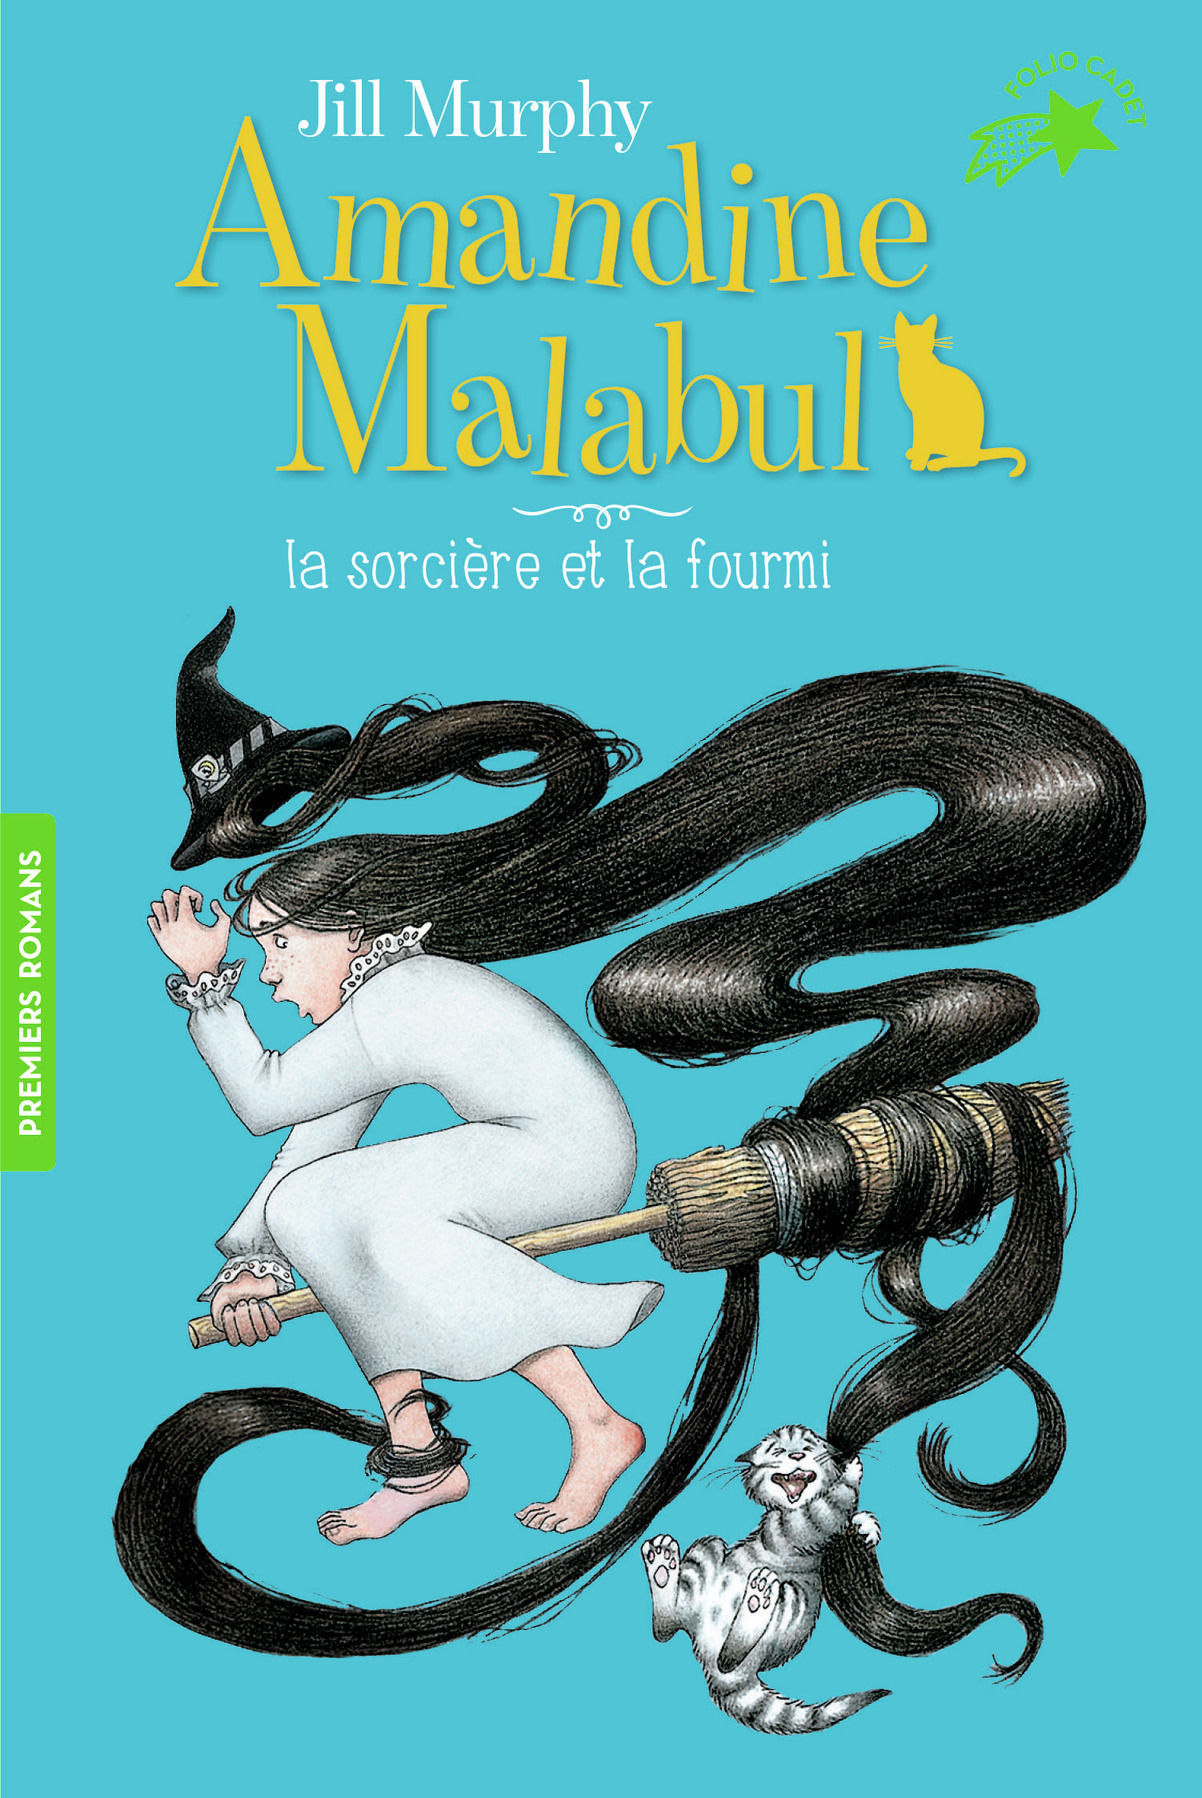 AMANDINE MALABUL, LA SORCIERE ET LA FOURMI